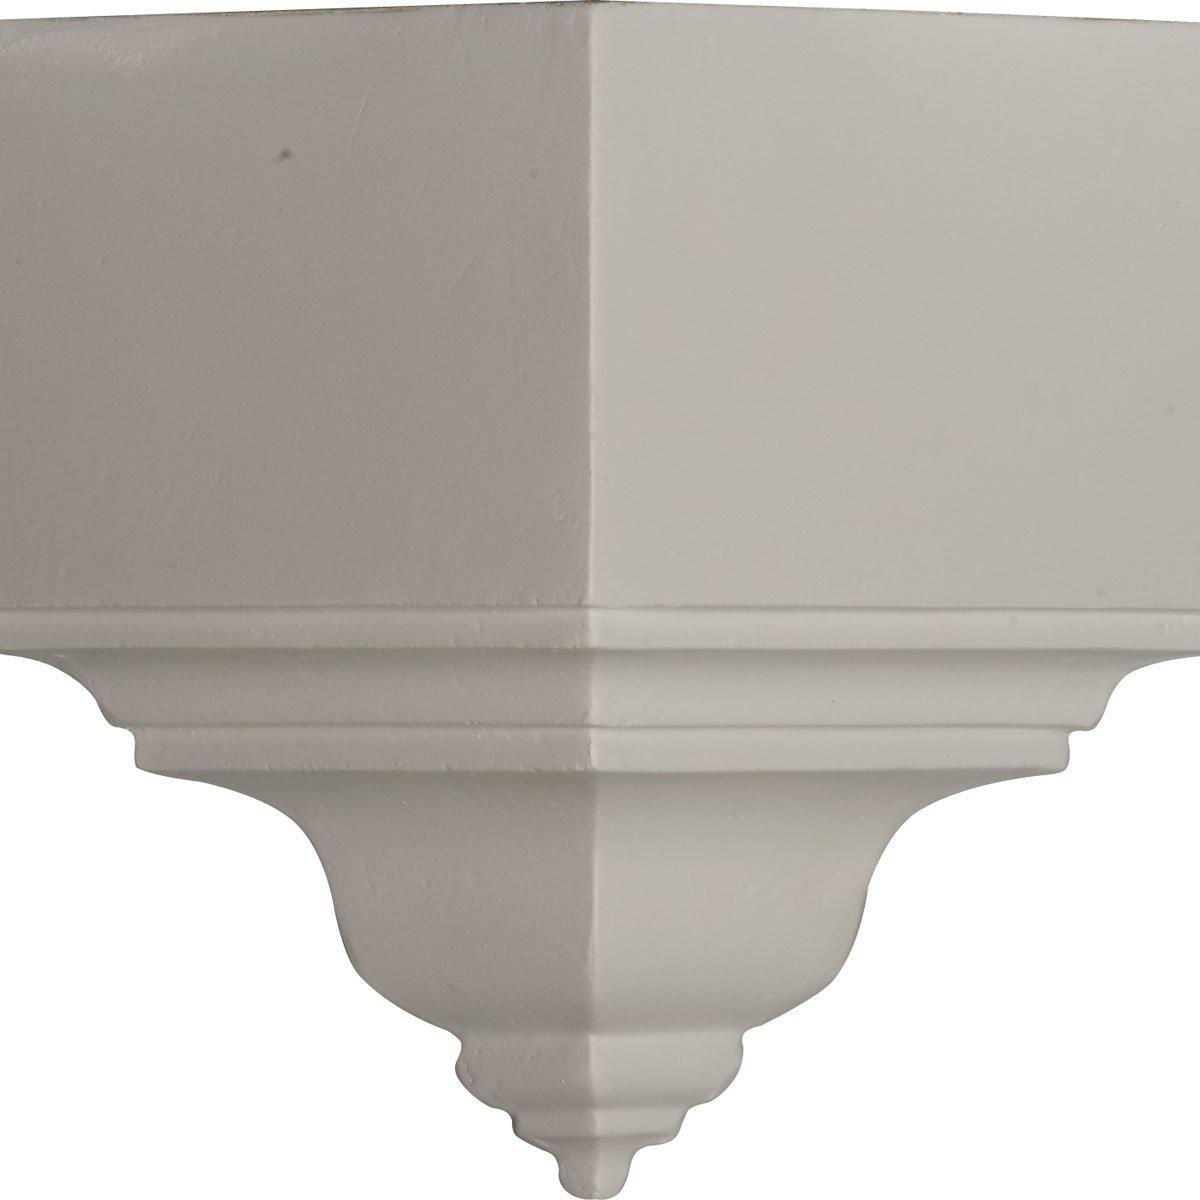 Ekena Millwork MOC03X03BI 3 1//8 P X 7 3//4 H Outside Corner for Molding Profiles Less Than 3 1//8 P and 3 7//8 H